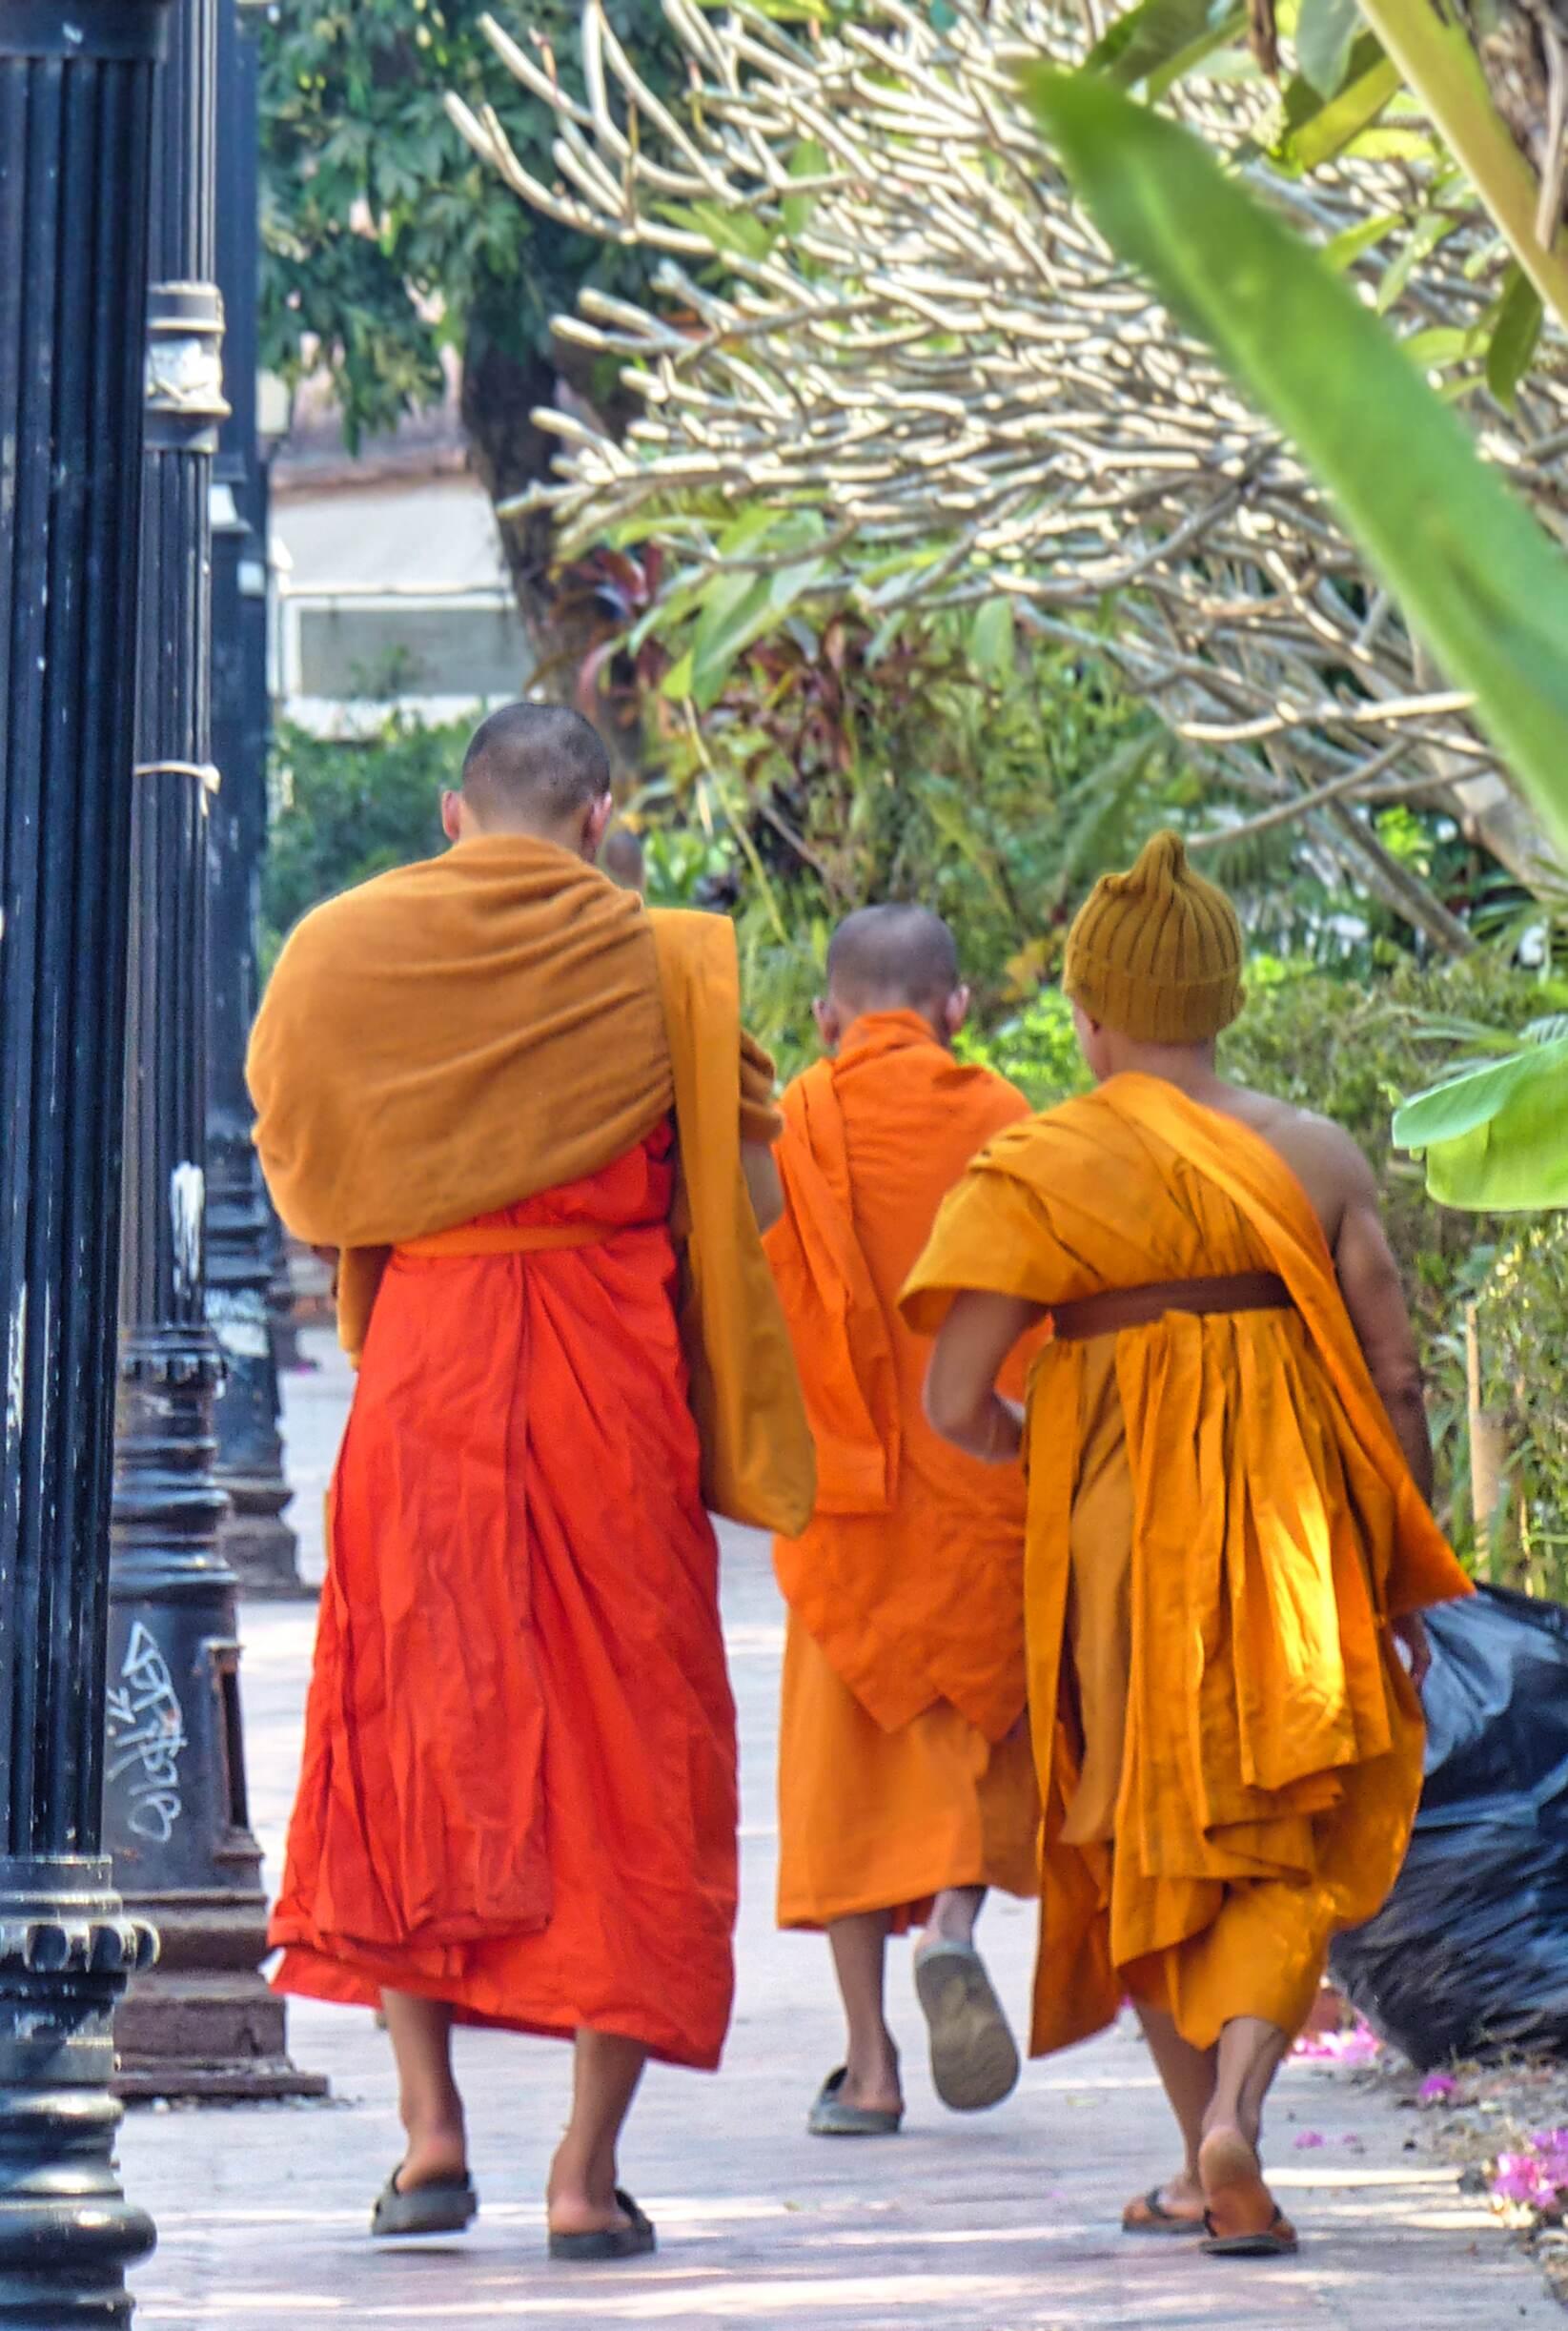 Men in orange robes seen from behind walking down a street